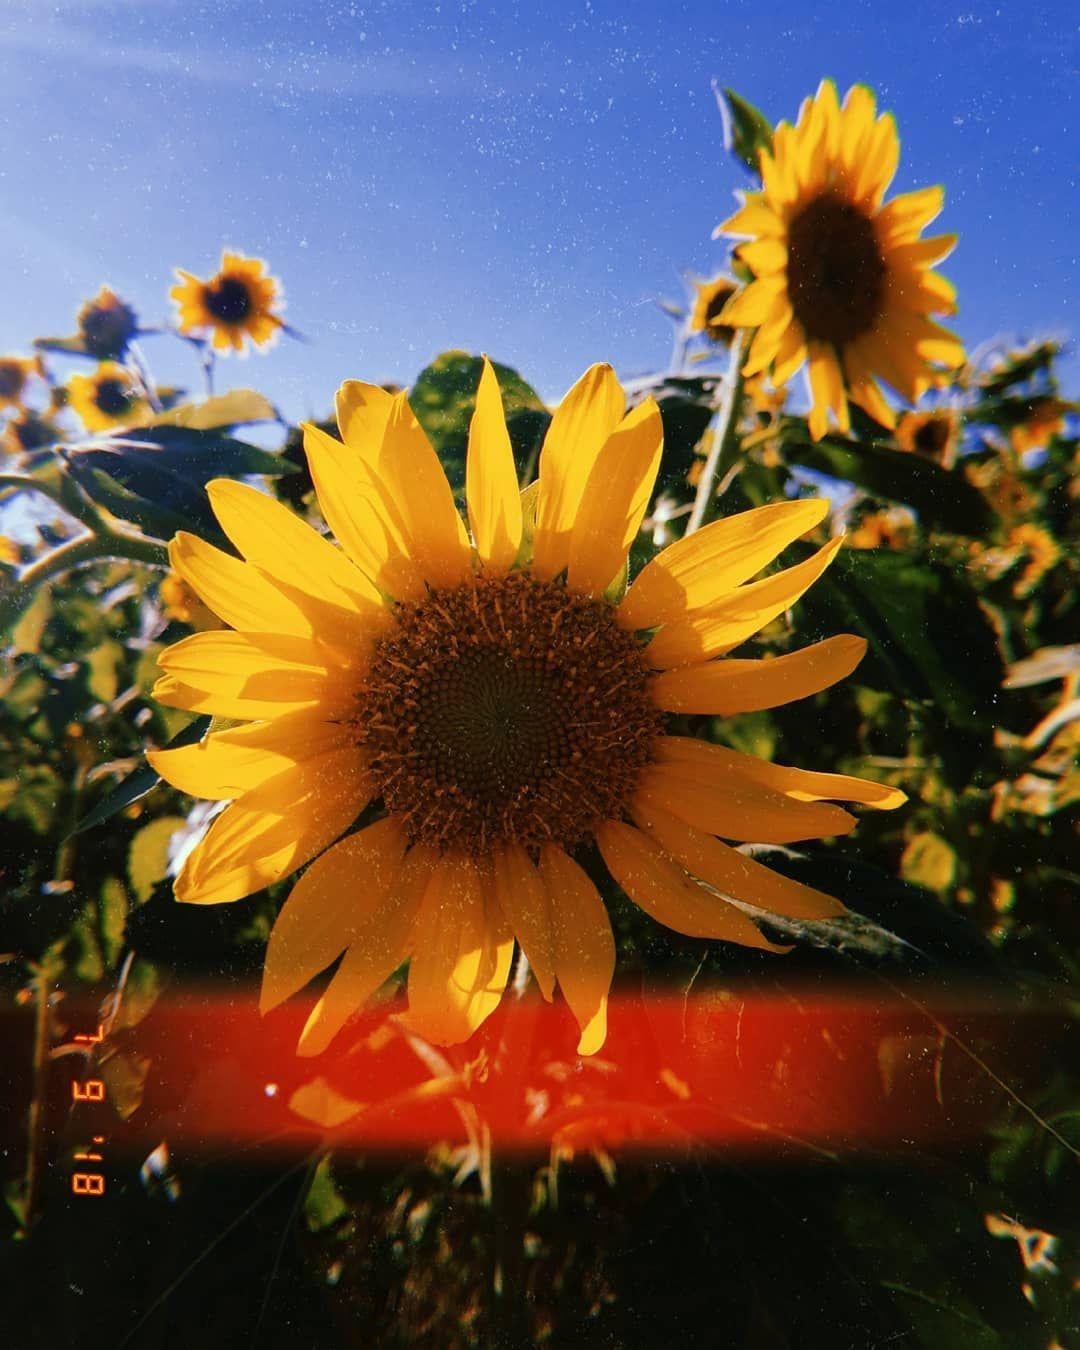 Insta Heatherlynn21 Sunflowers Flowers Huji Hujicam Cute Tumblr Wallpaper Sunflower Wallpaper Tumblr Photography